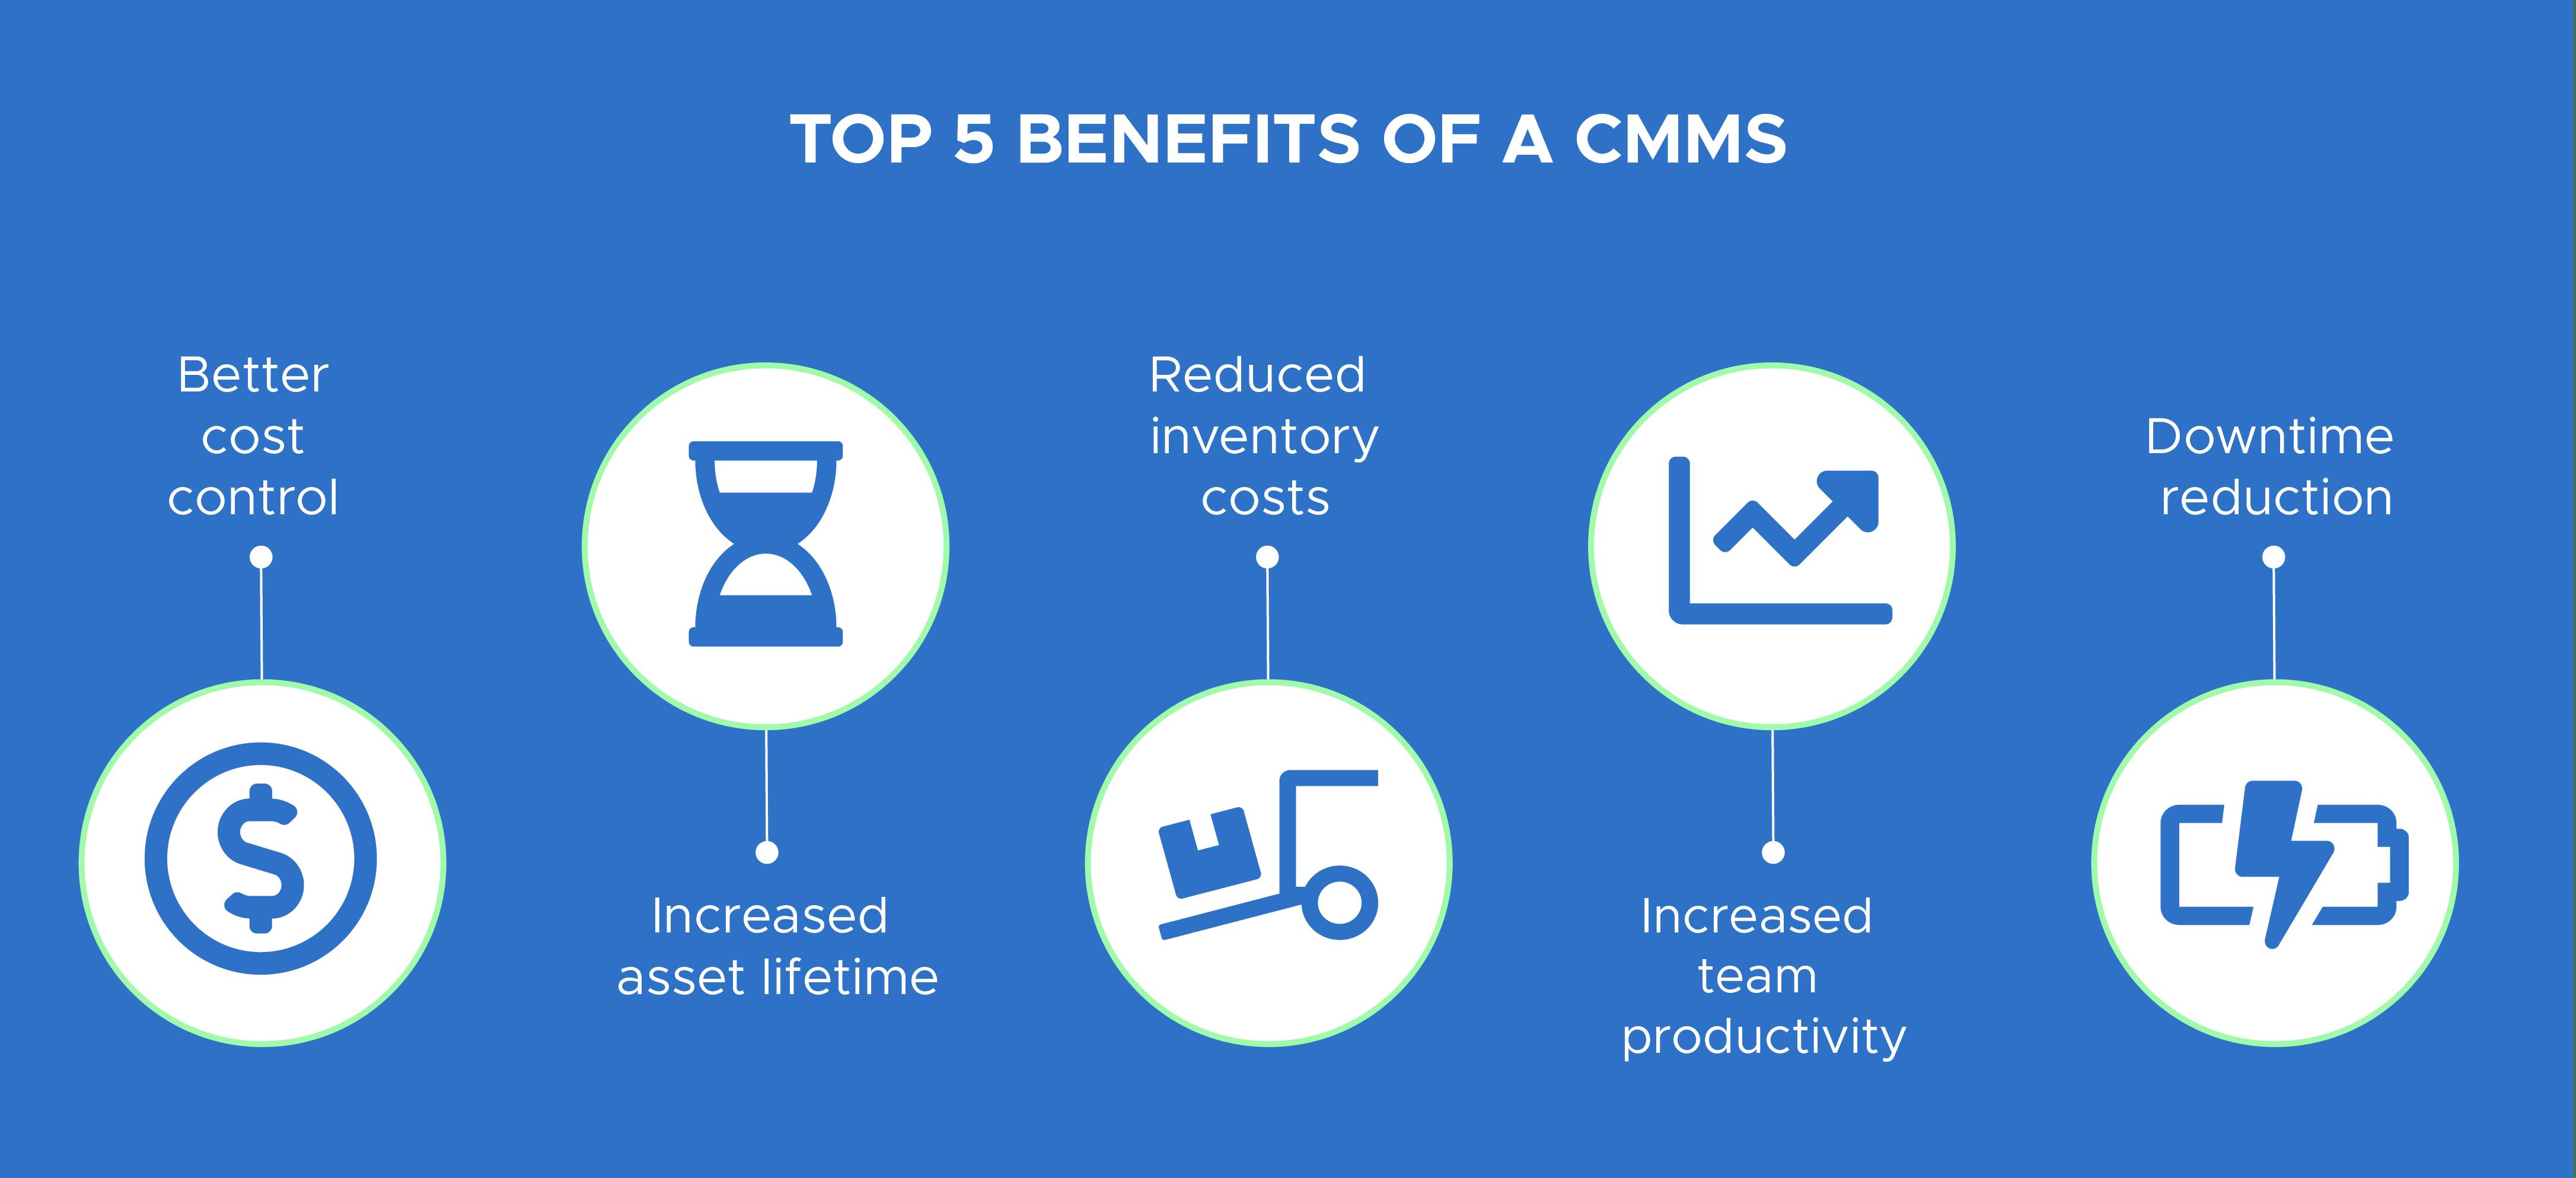 Advantages of a CMMS